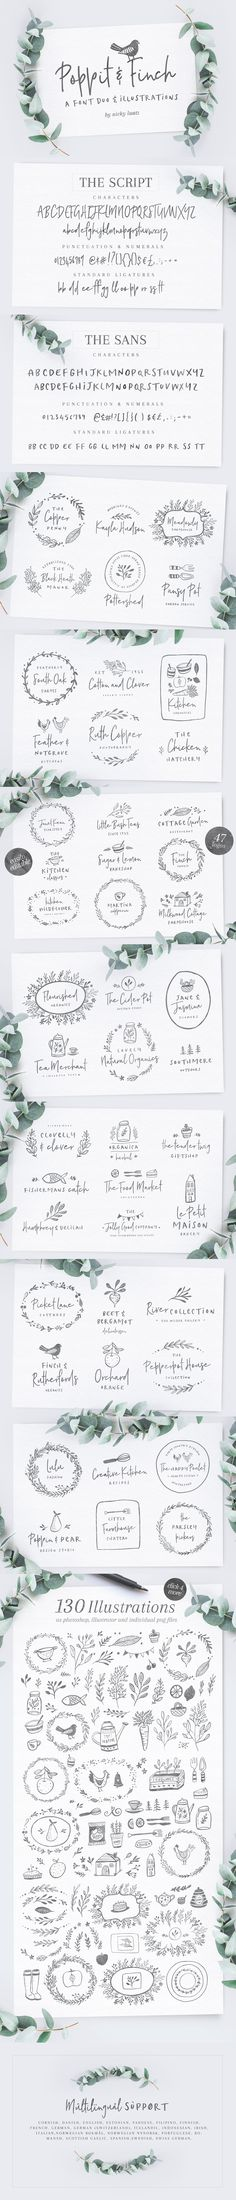 Poppit & Finch Fonts & Illustrations by Nicky Laatz